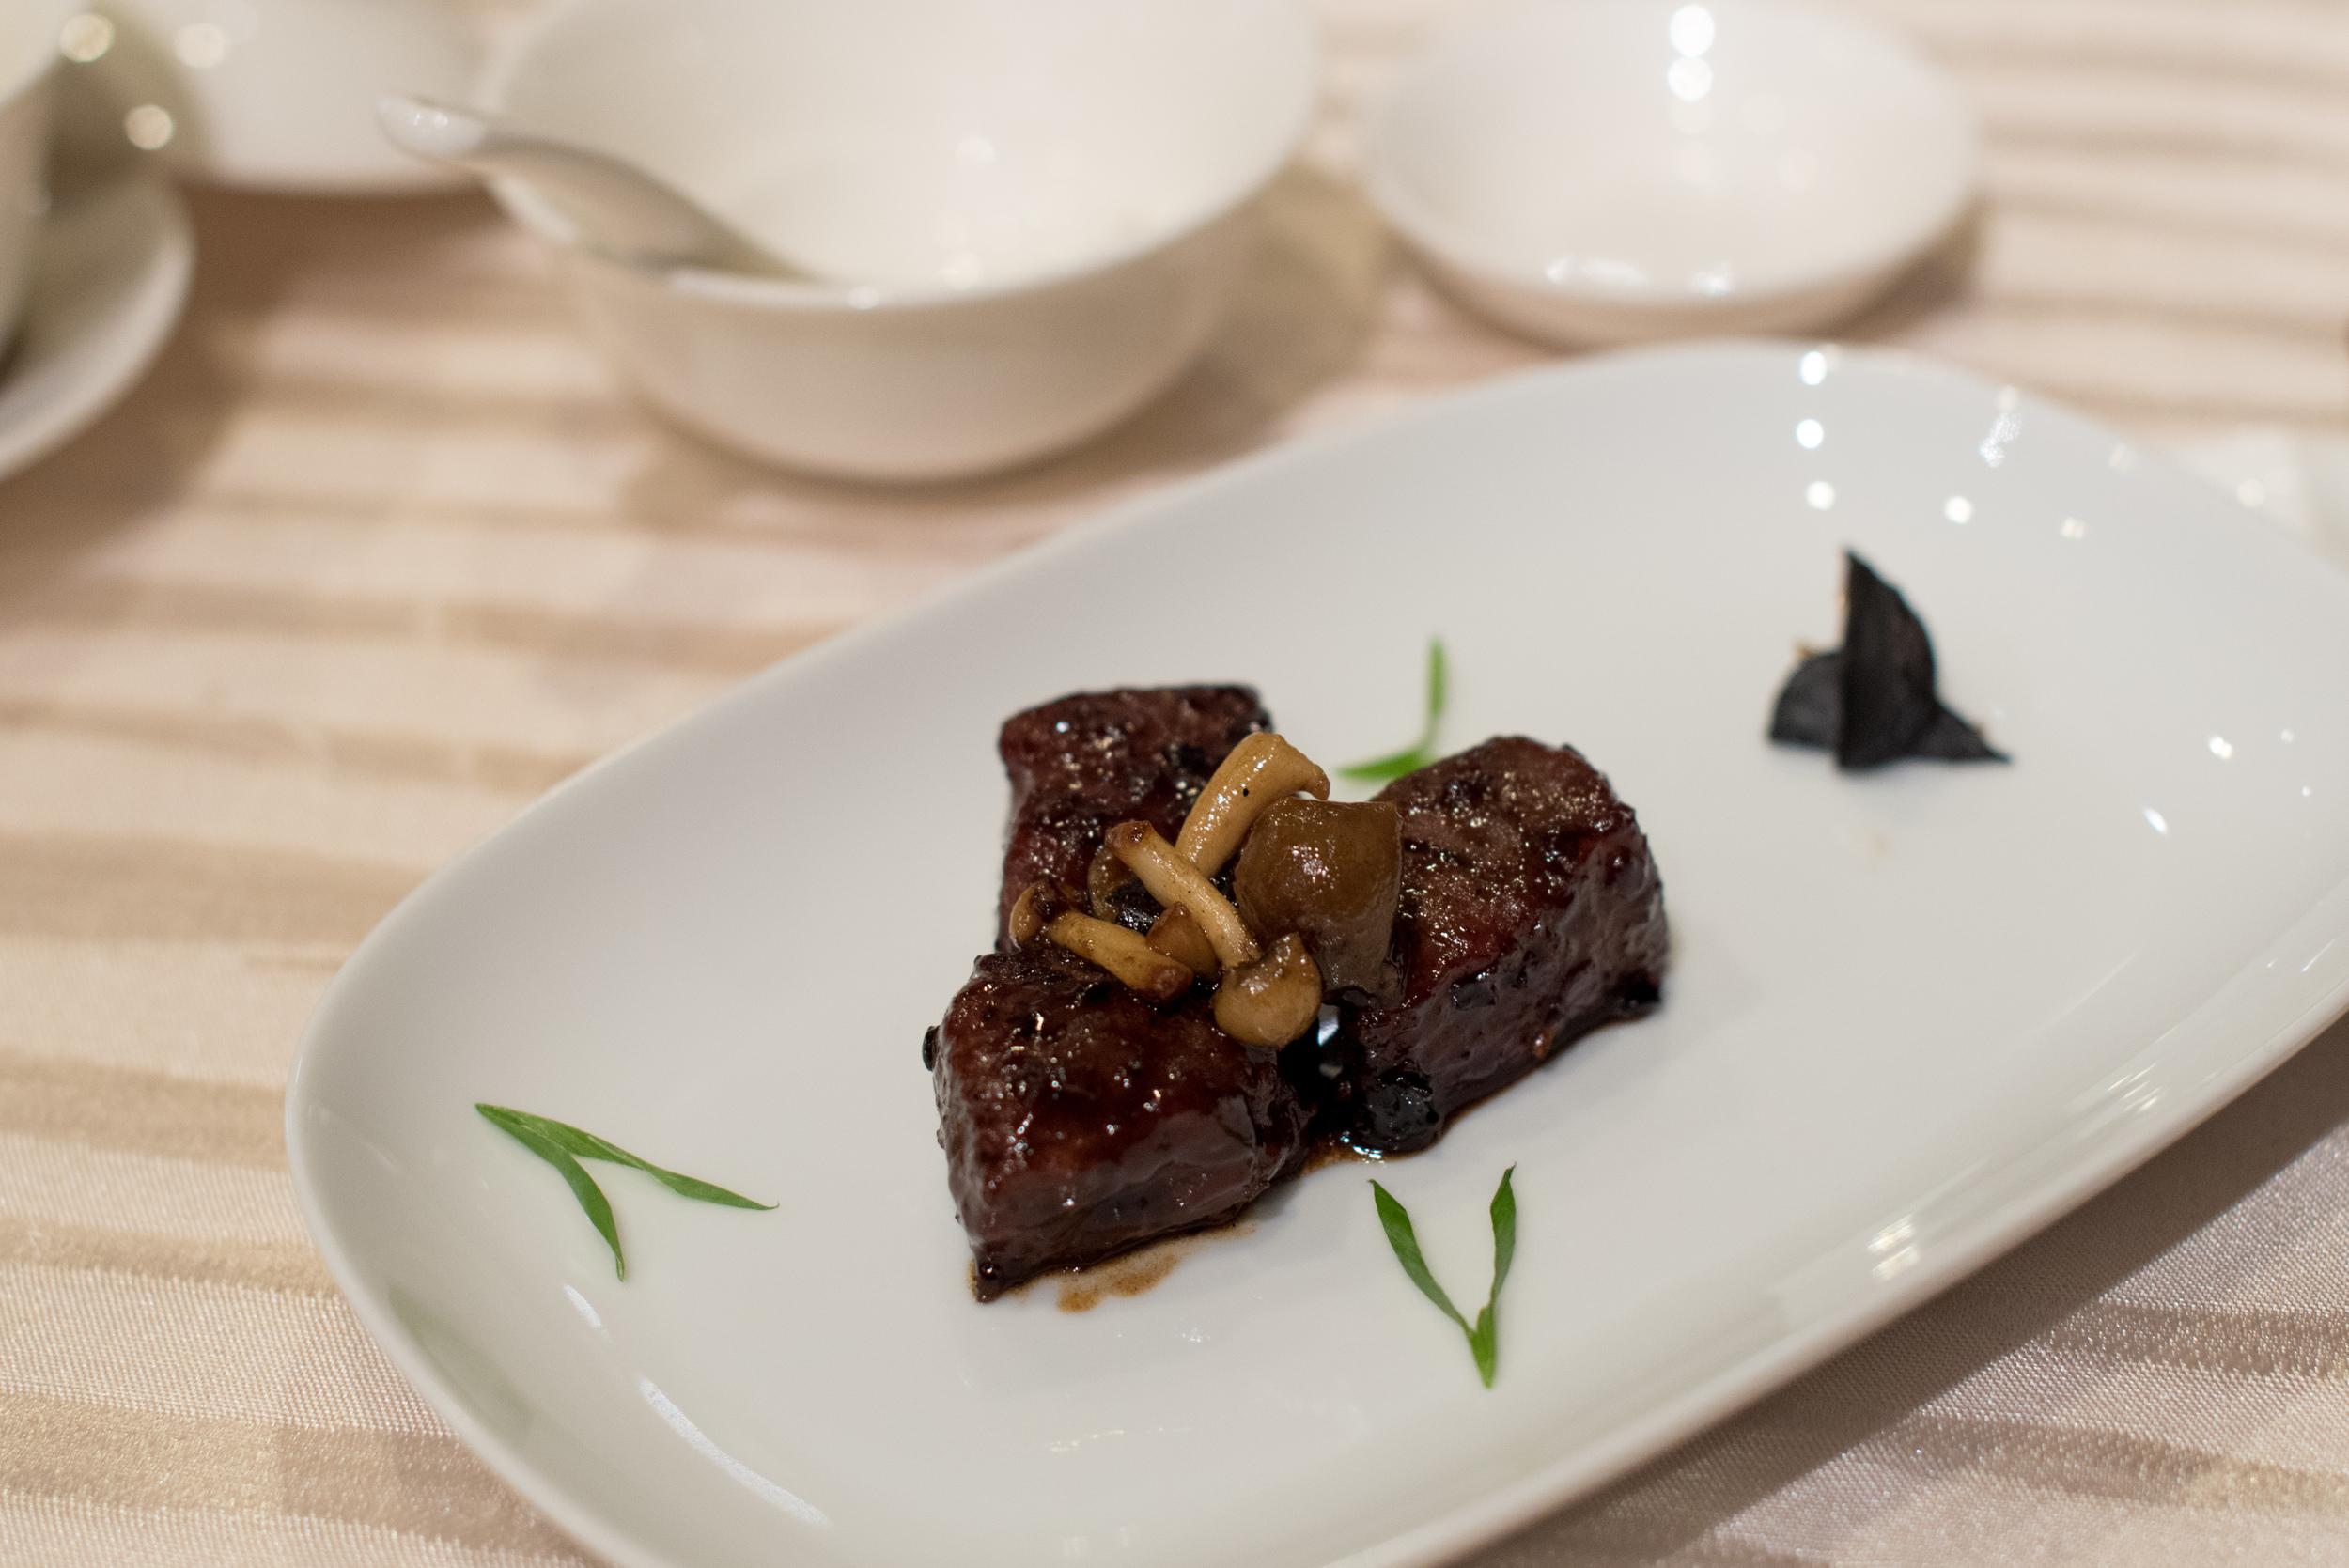 Wok-fried Beef Cube with Black Garlic Sauce    Wan Hao - Singapore Marriott Tang Plaza Hotel